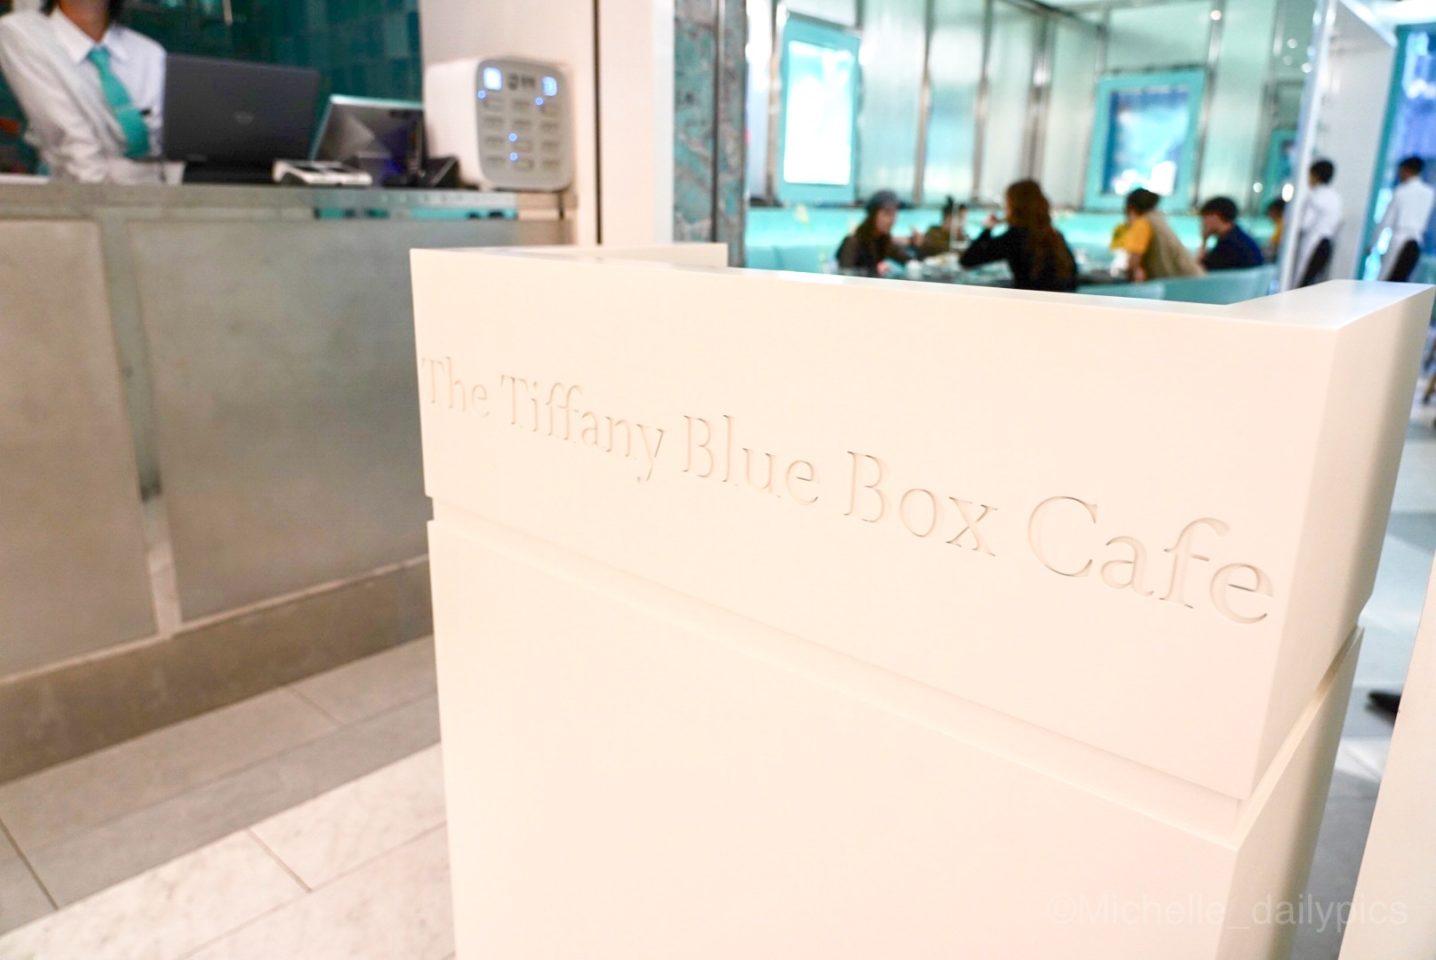 dsc07326 - The Tiffany Blue Box Cafe - 上海でティファニーアフタヌーンティーを満喫